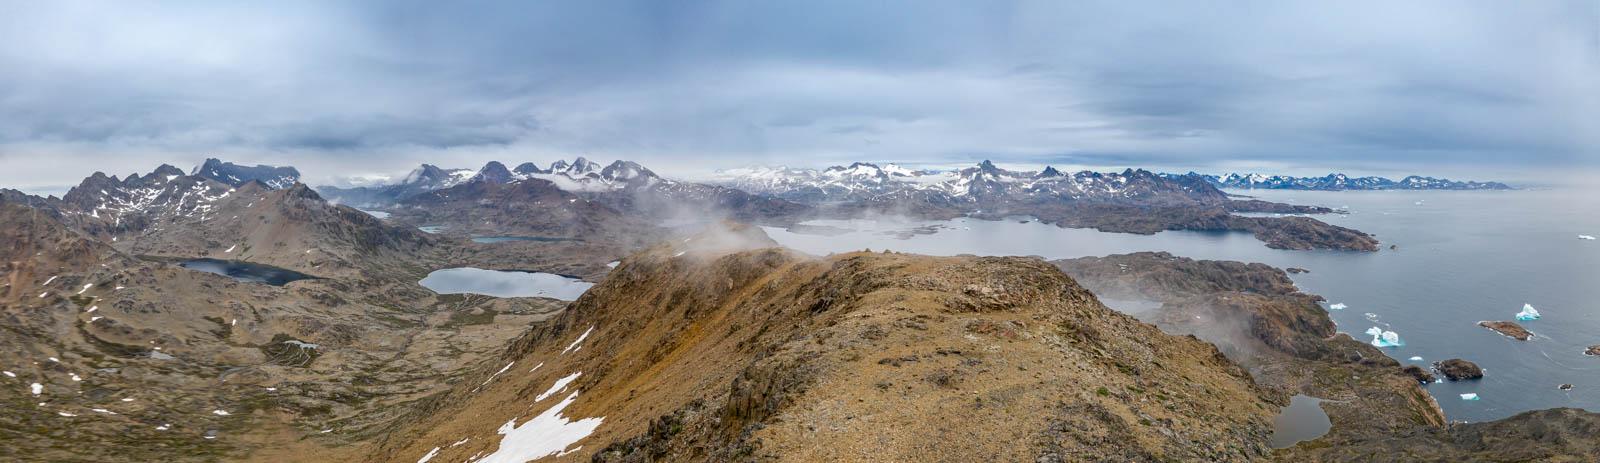 Ostgrönland, Grönland, Tasiilaq, See, Drohne, Mavic 2 Pro